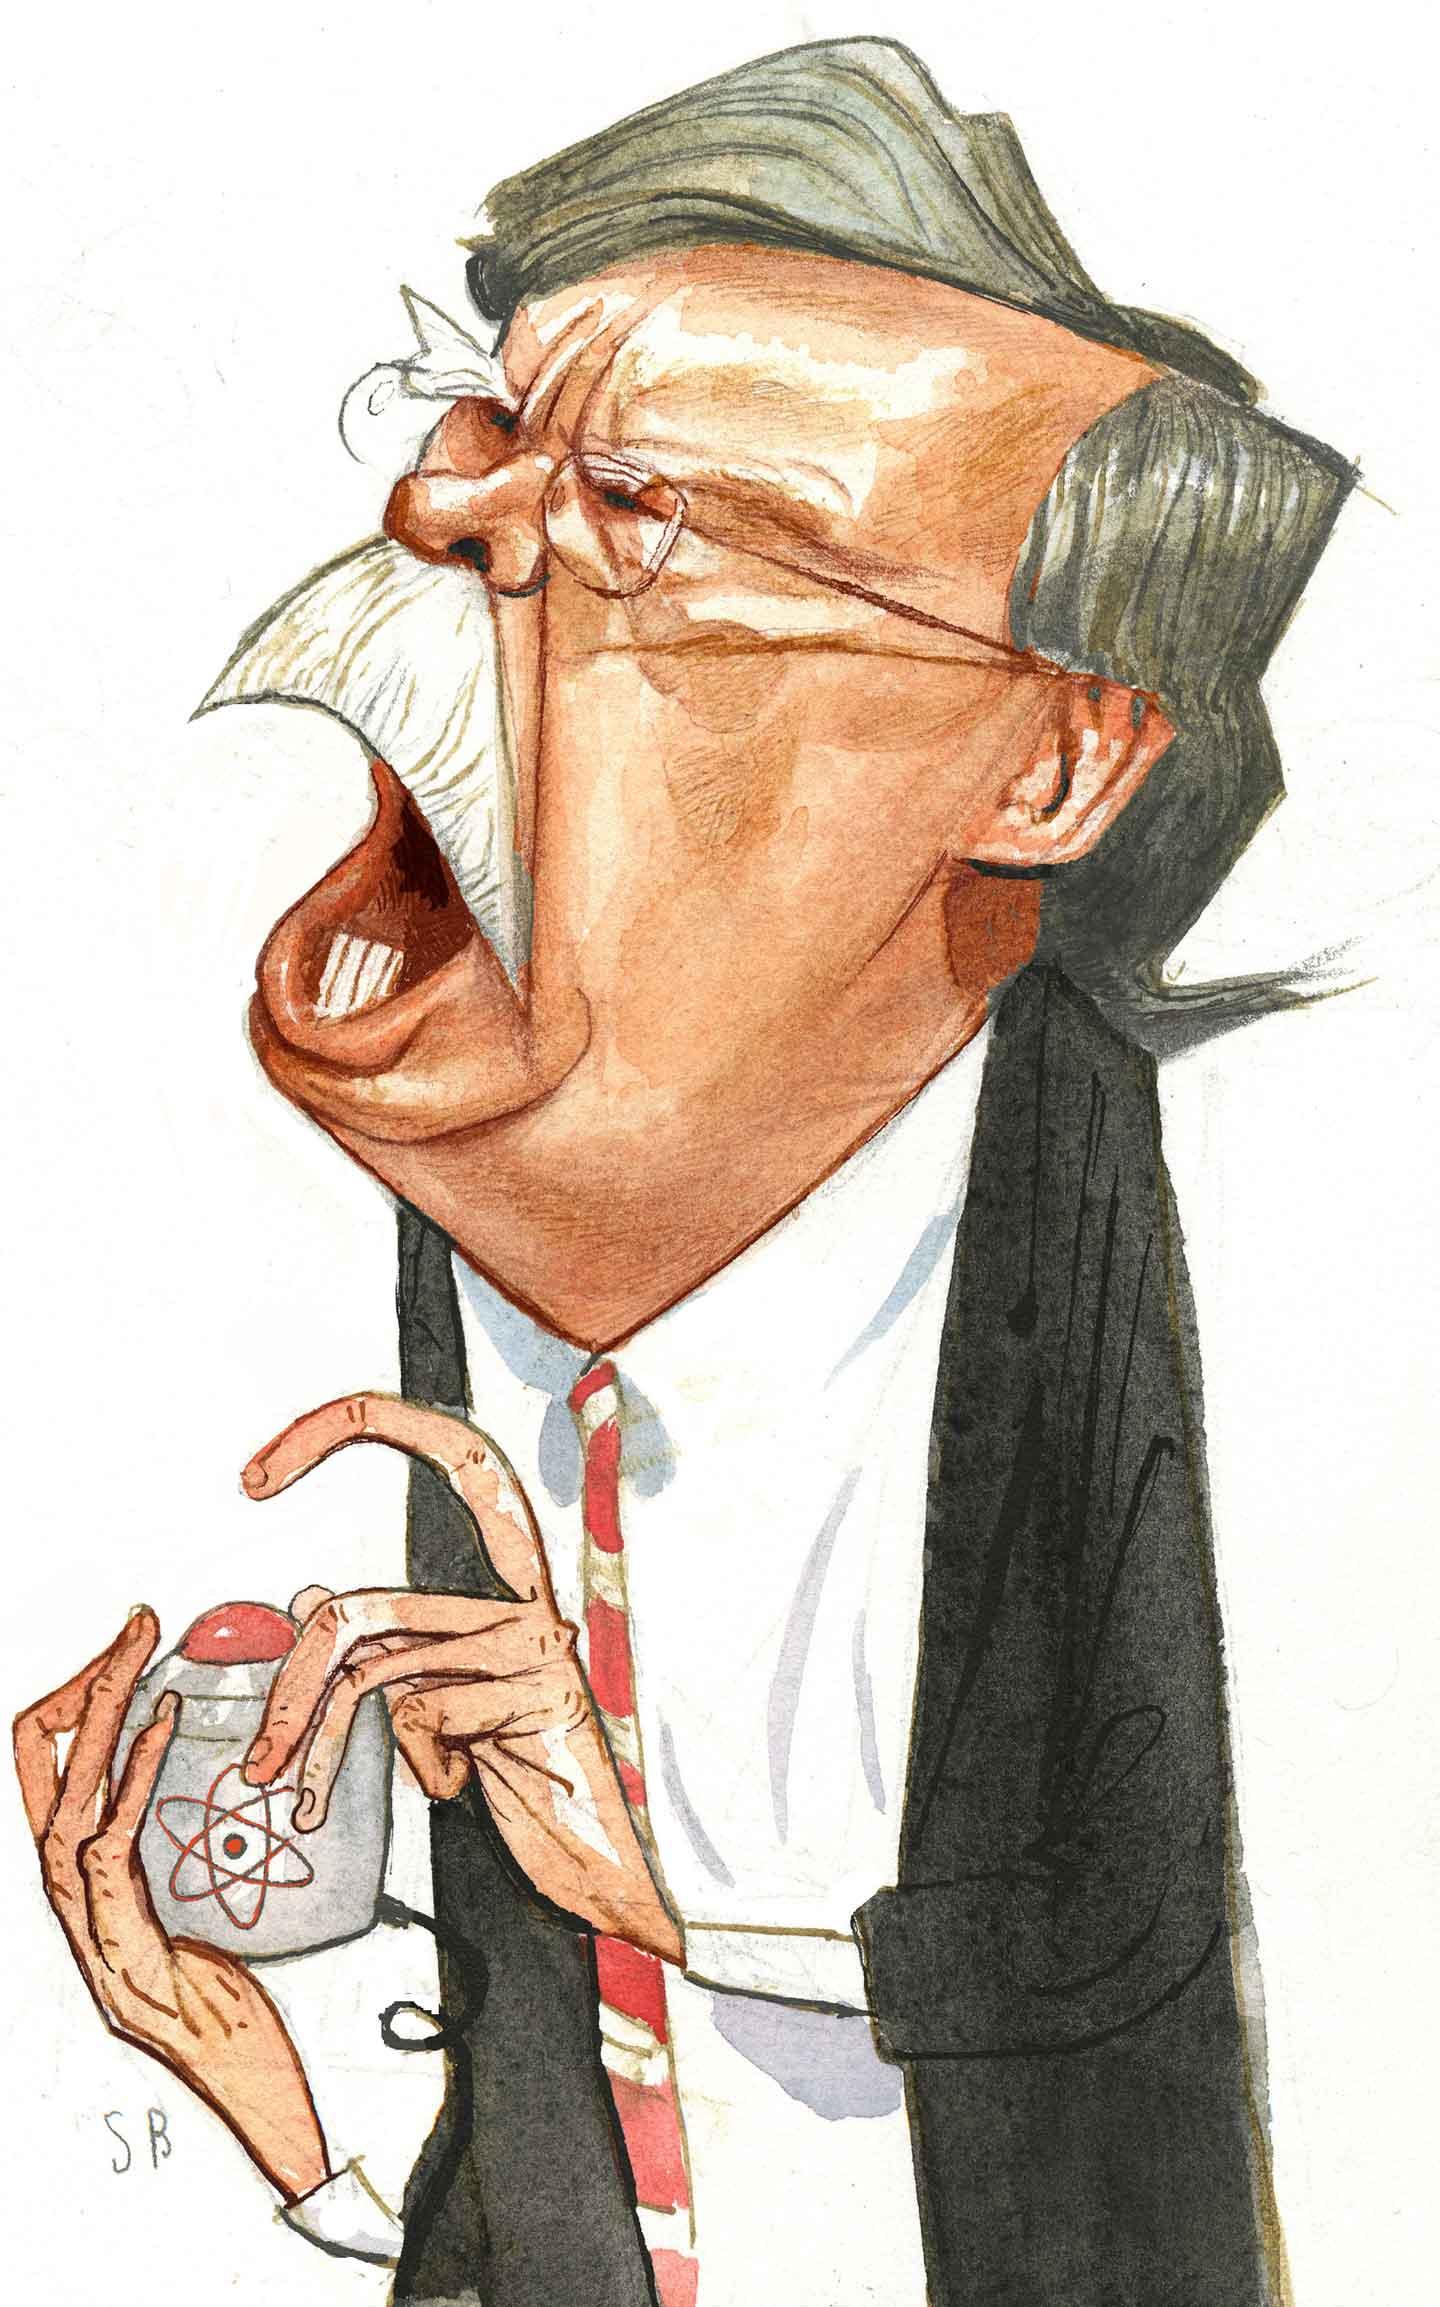 John Bolton's finger on the button by Steve Brodner -  stevebrodner.com